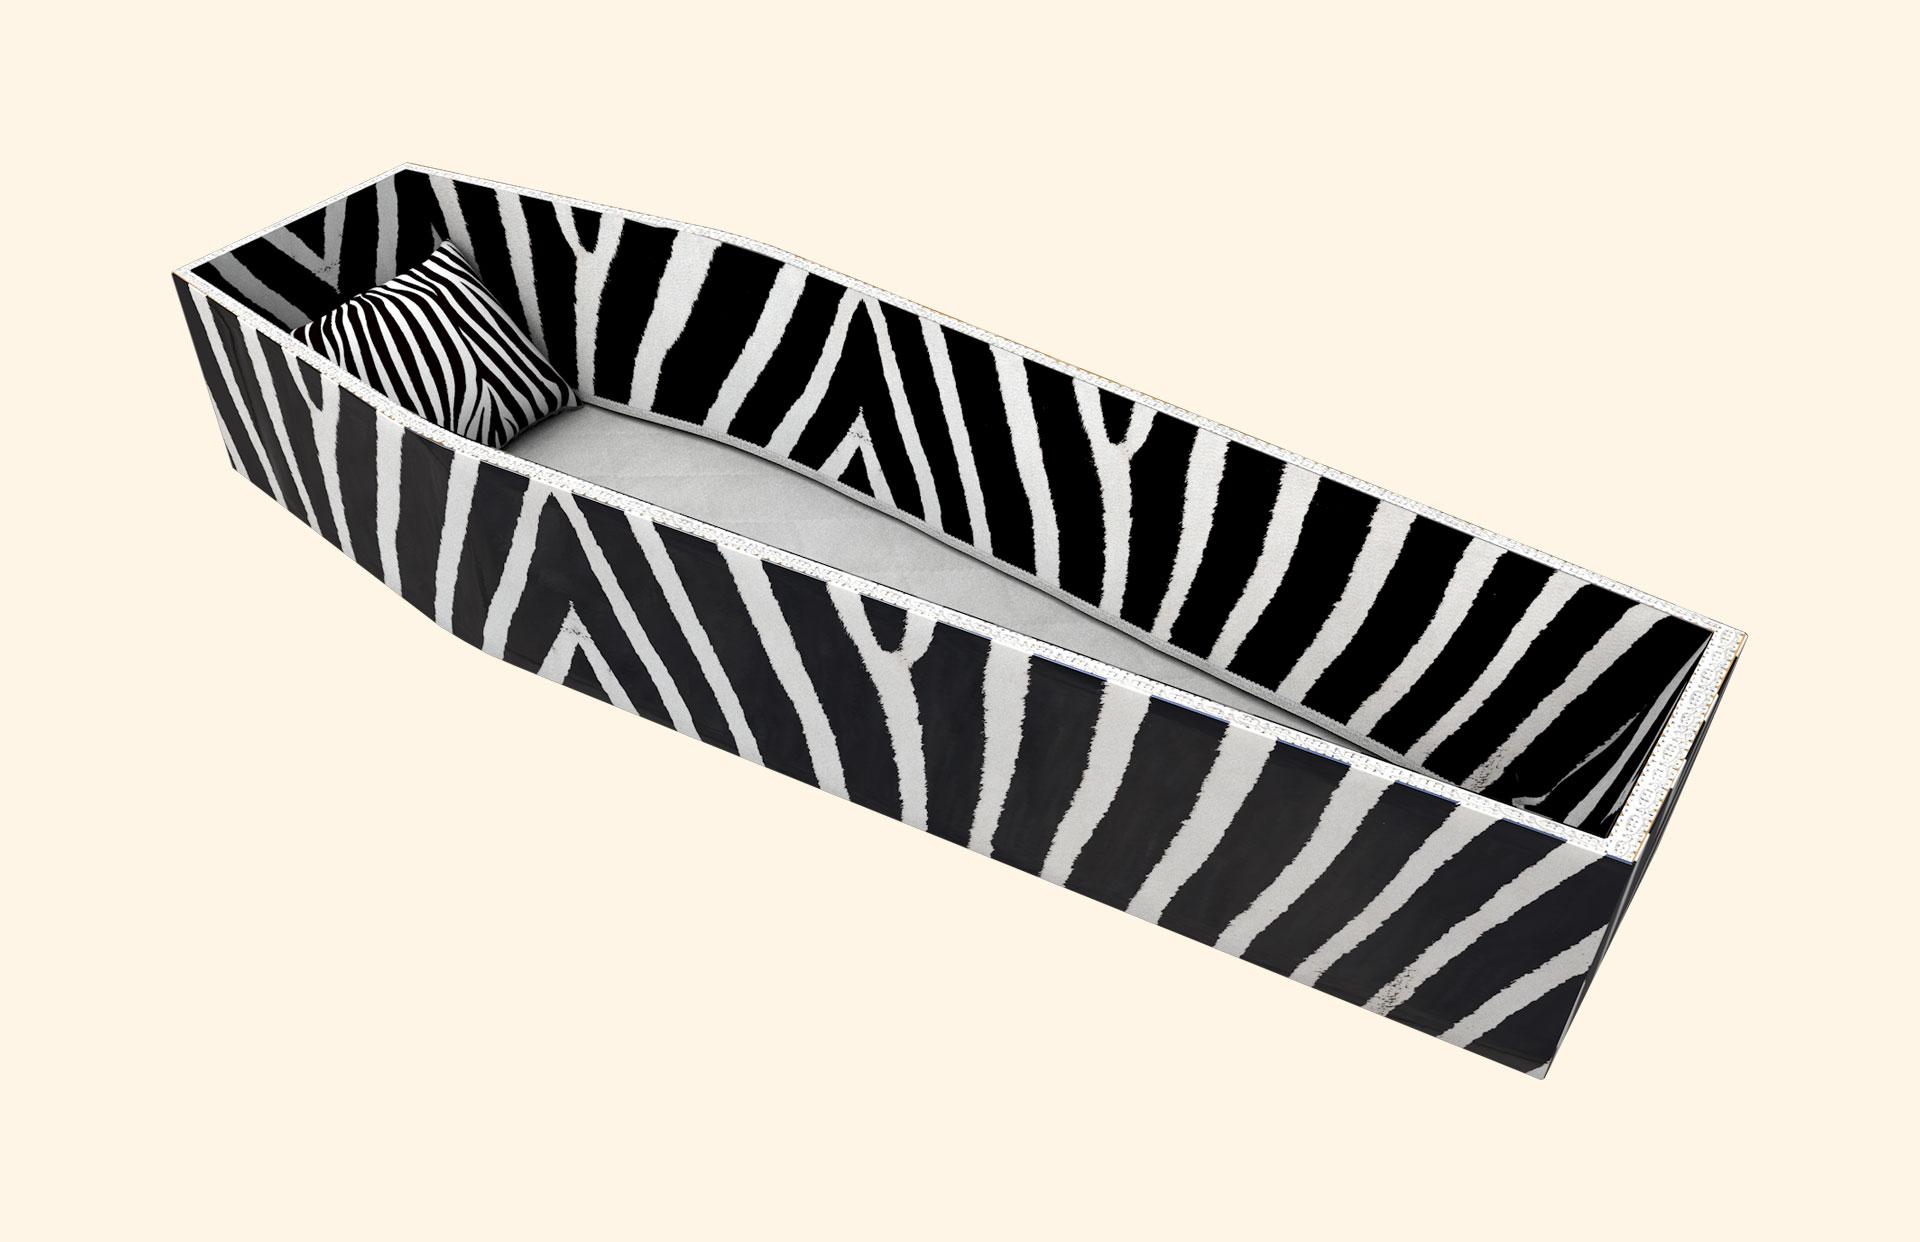 Zebra side lining 3D